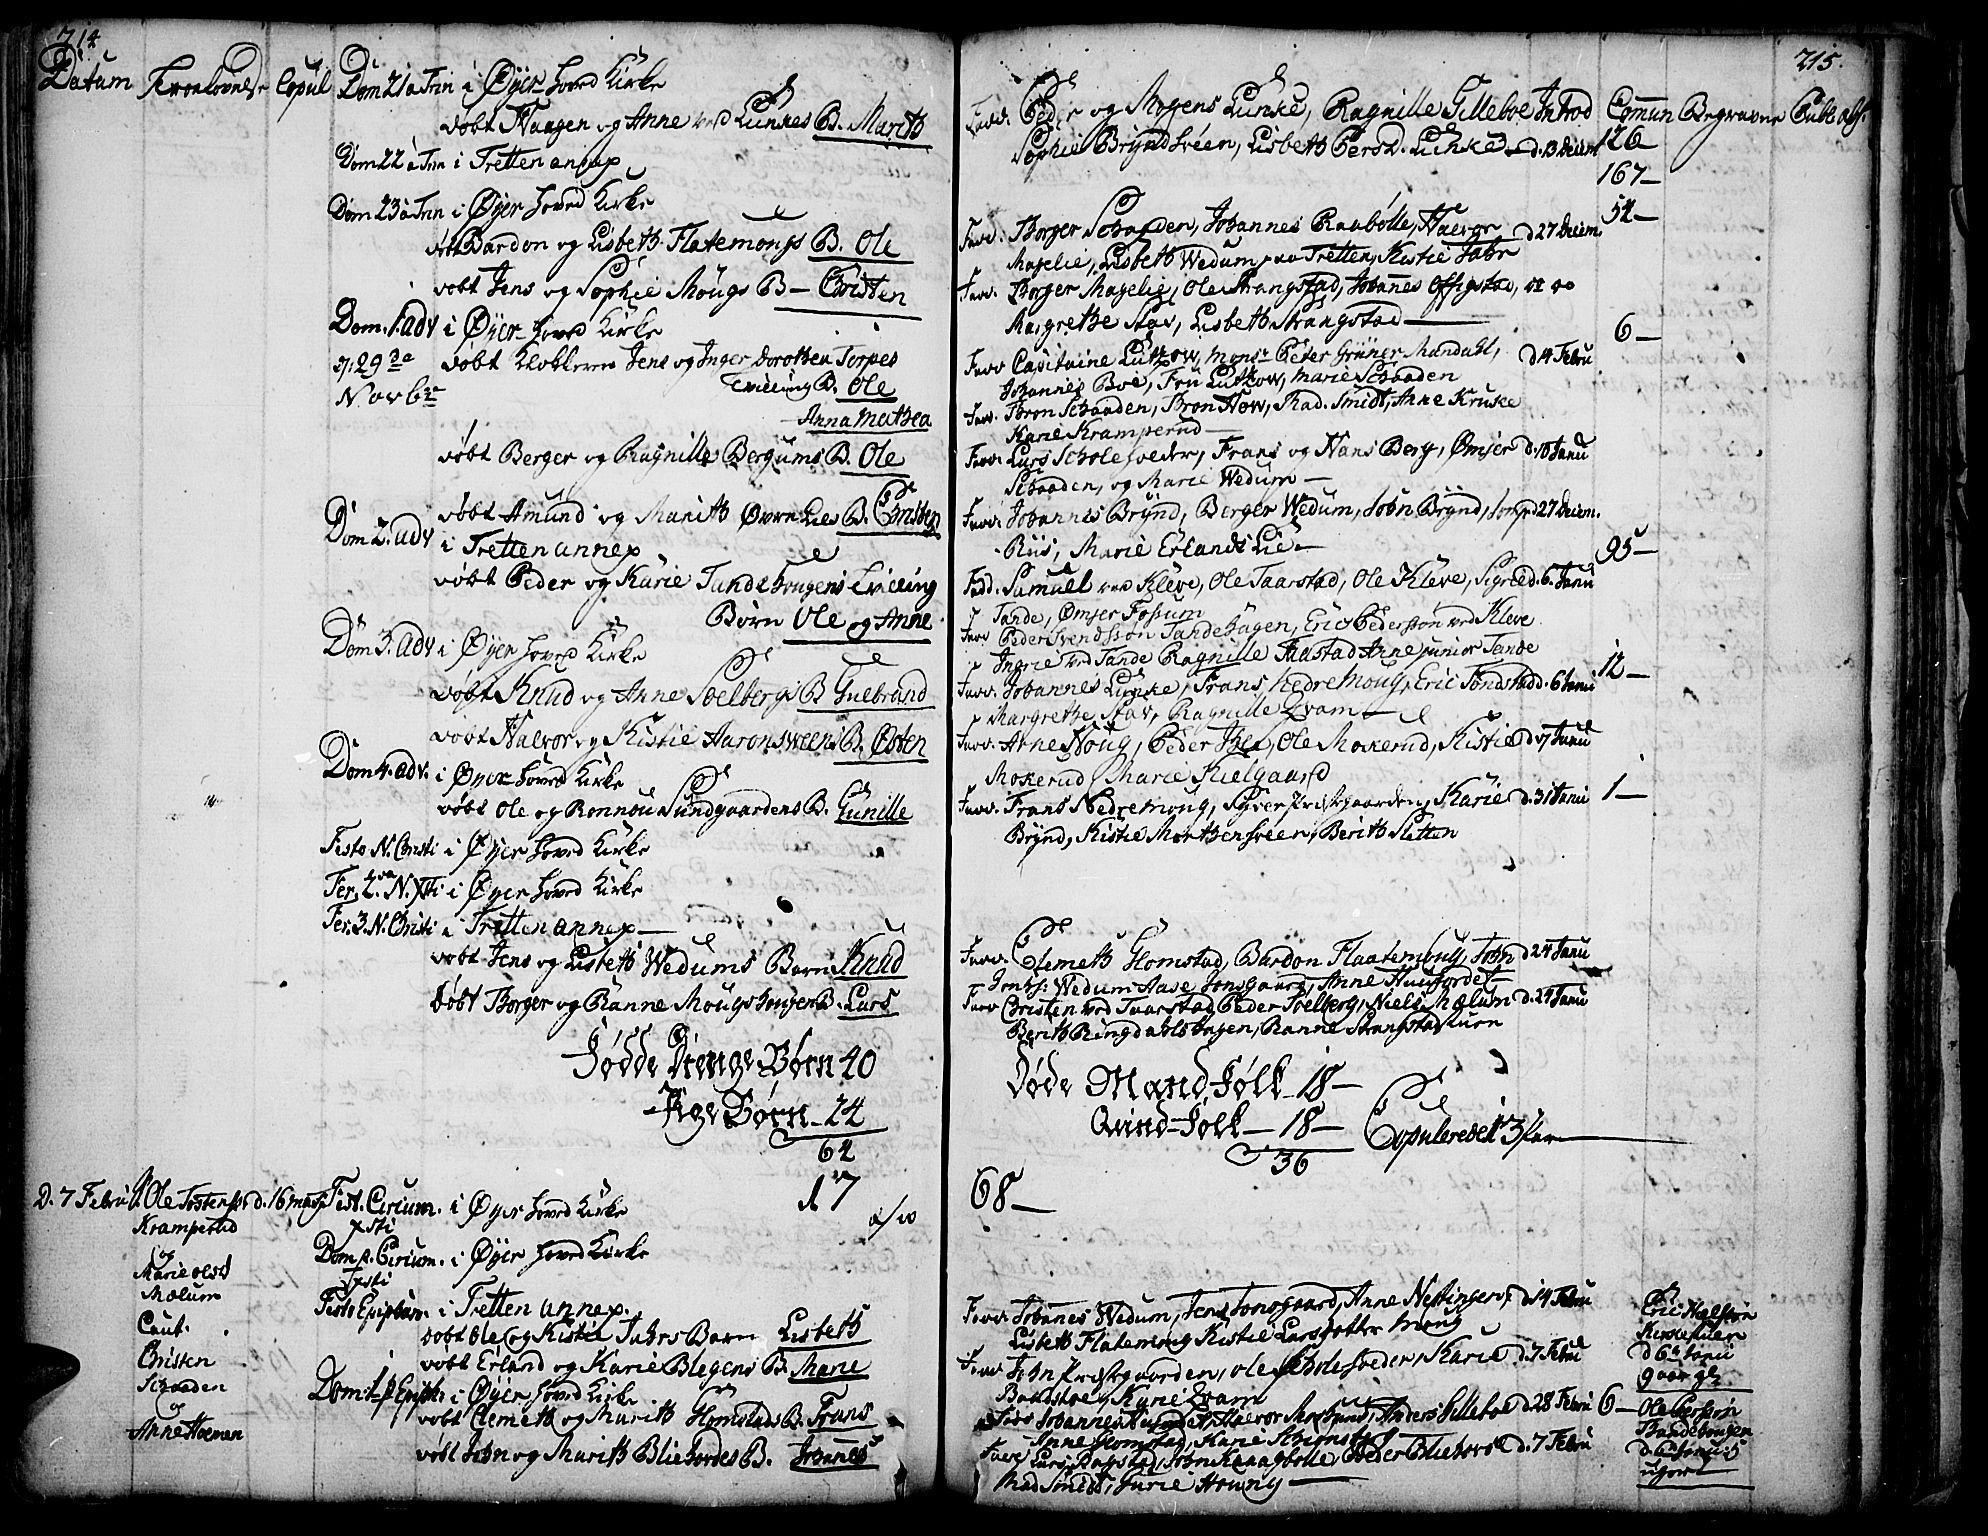 SAH, Øyer prestekontor, Ministerialbok nr. 2, 1733-1784, s. 214-215